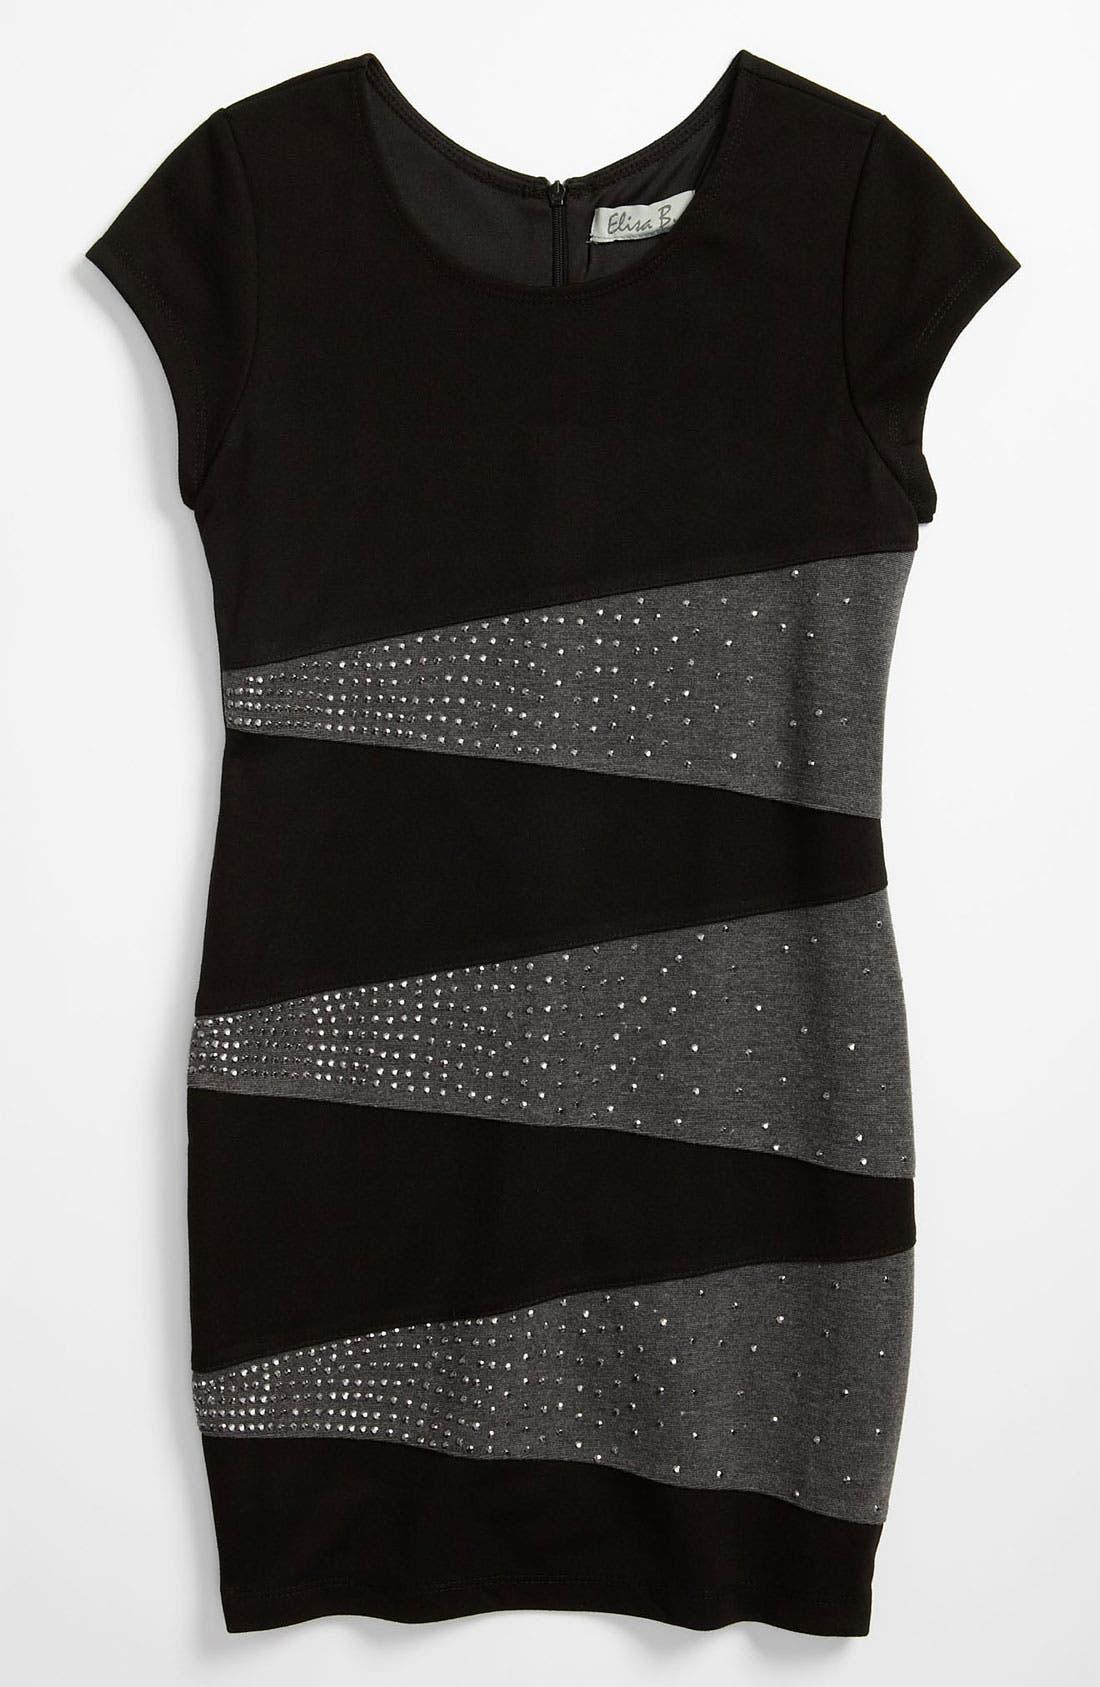 Alternate Image 1 Selected - Elisa B Knit Dress (Big Girls)